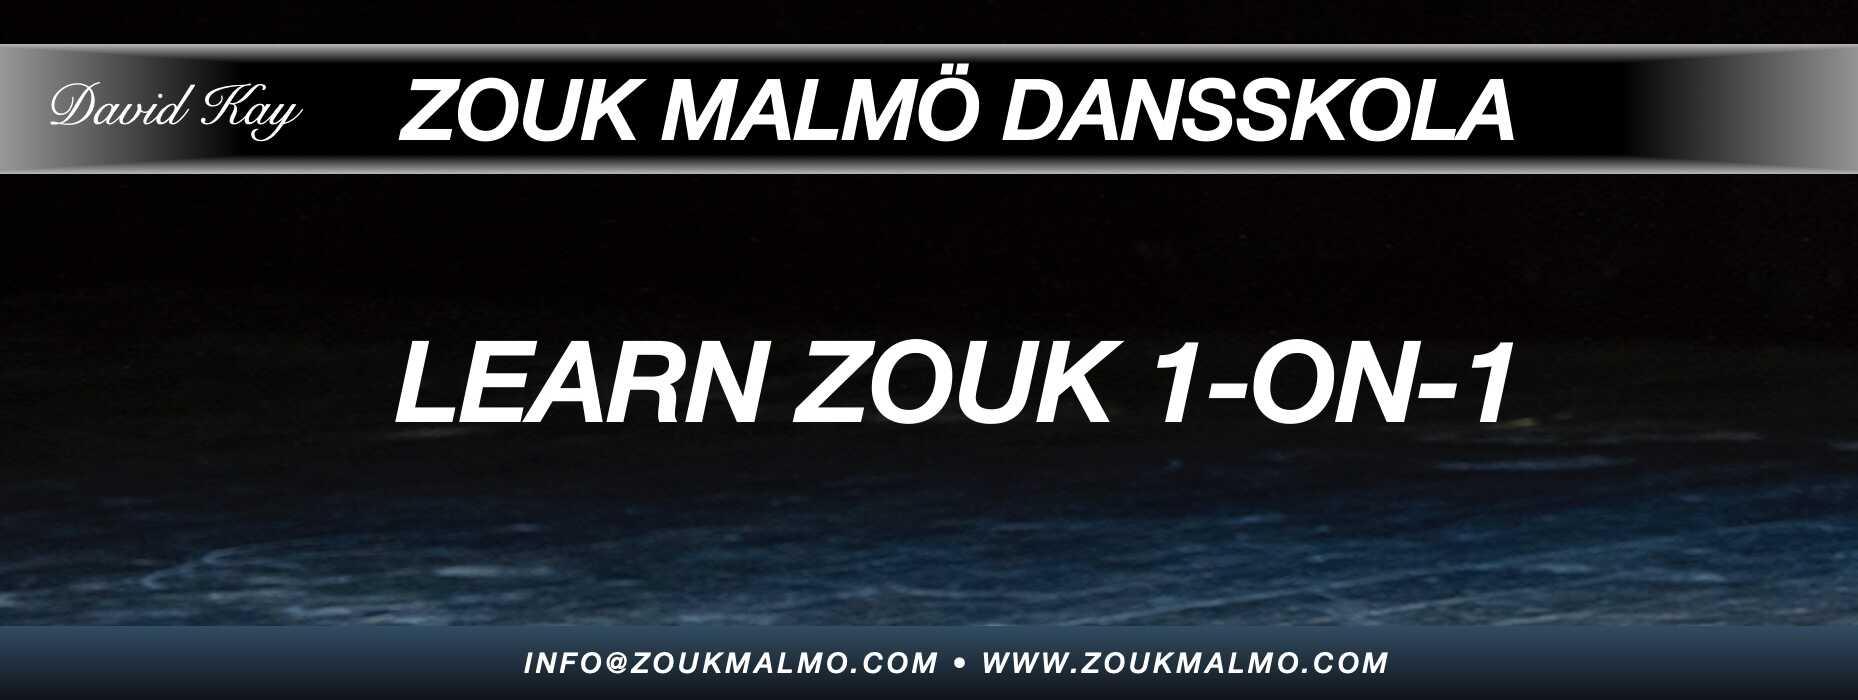 ZOUK Malmö Dansskola